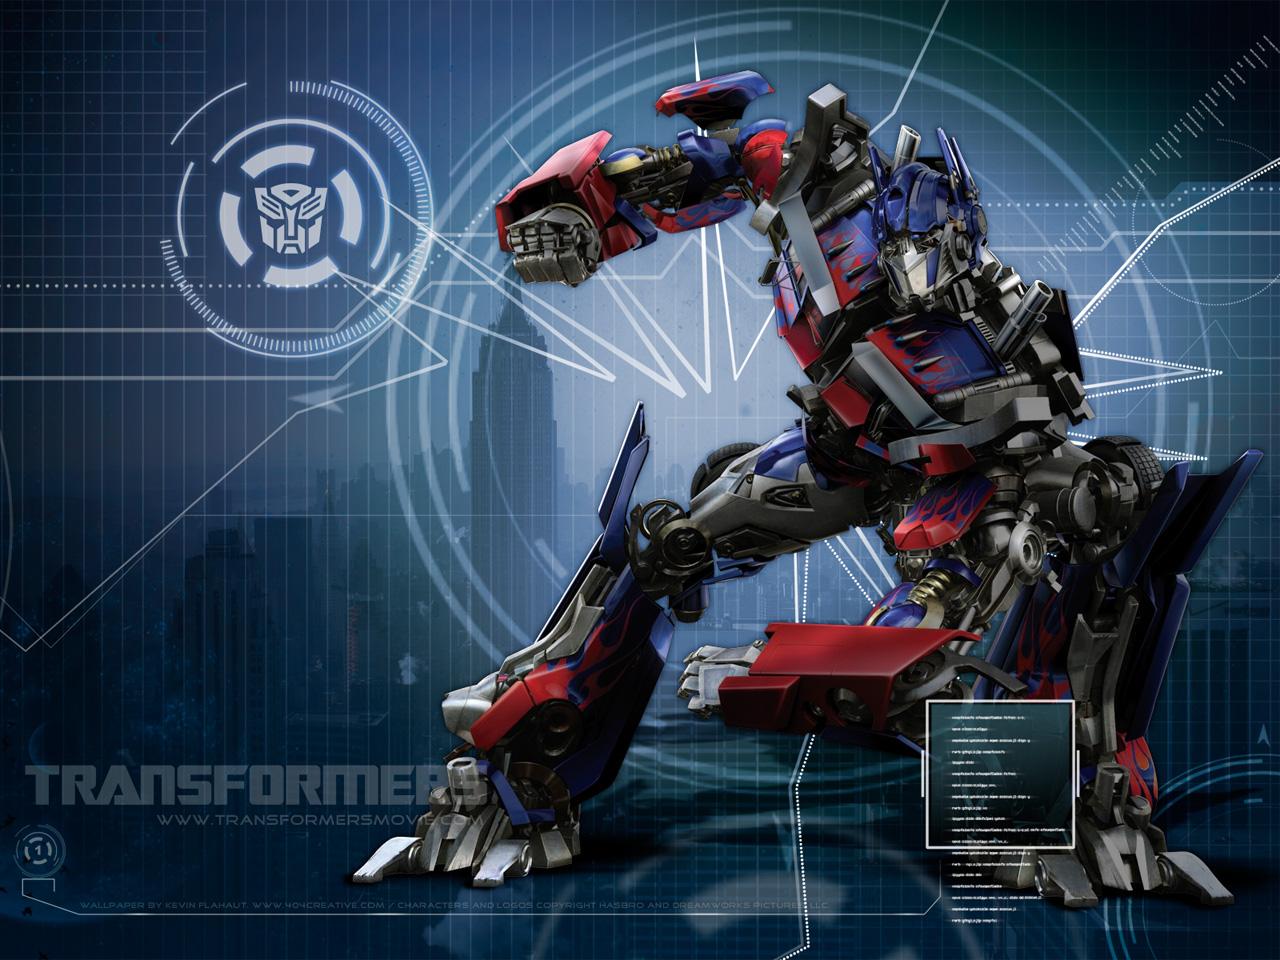 Transformers   Transformers Wallpaper 452273 1280x960